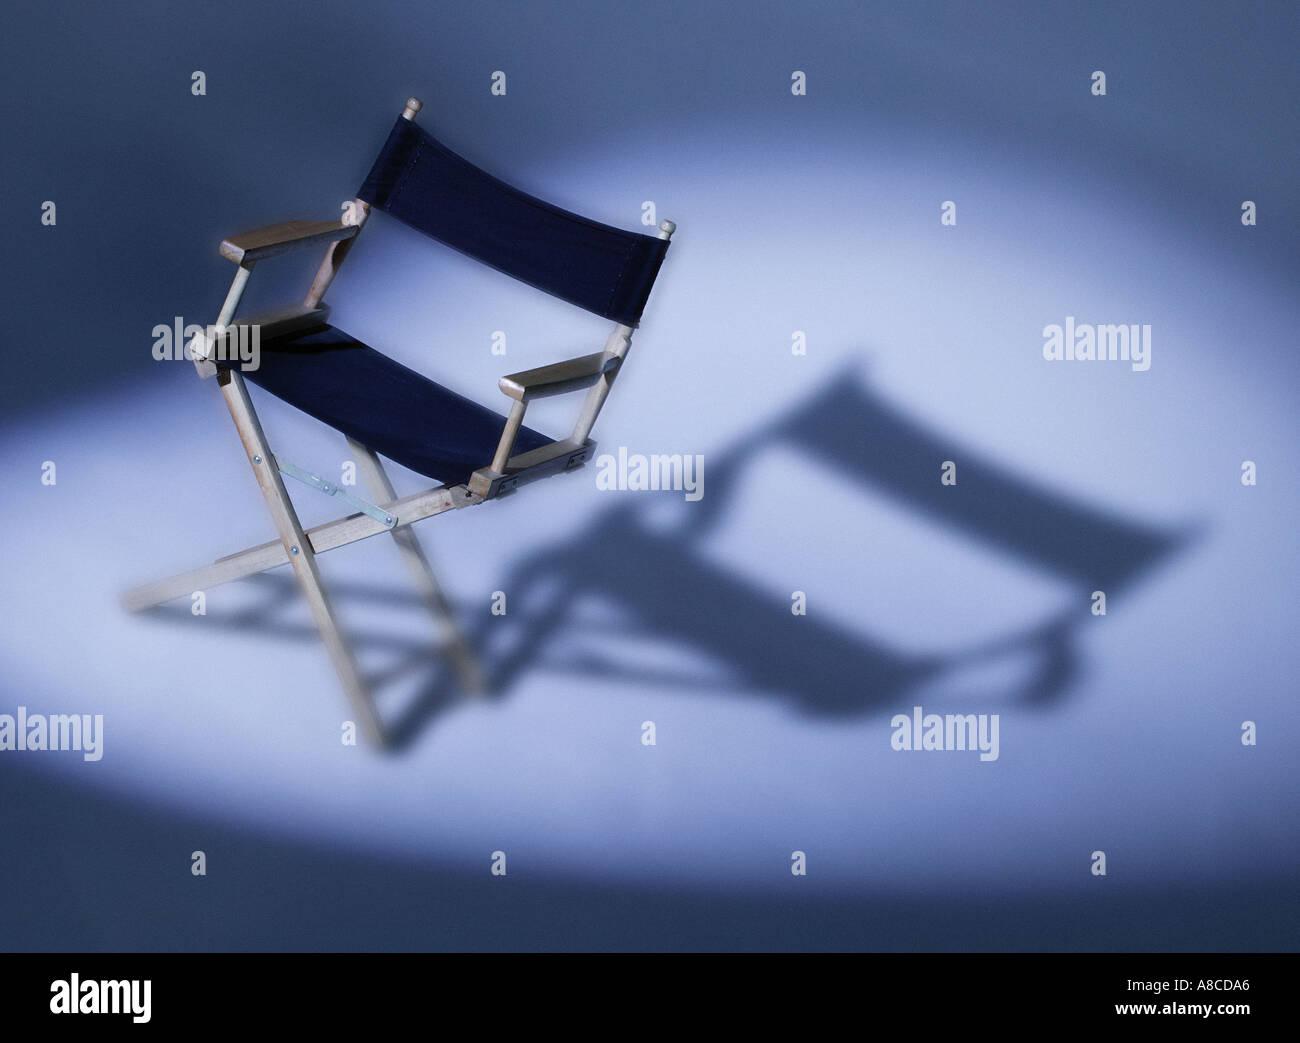 HOLZ UND LEINWAND FILM DIRECTORS CHAIR FALTEN IN SPOTLIGHT BALKEN Stockbild